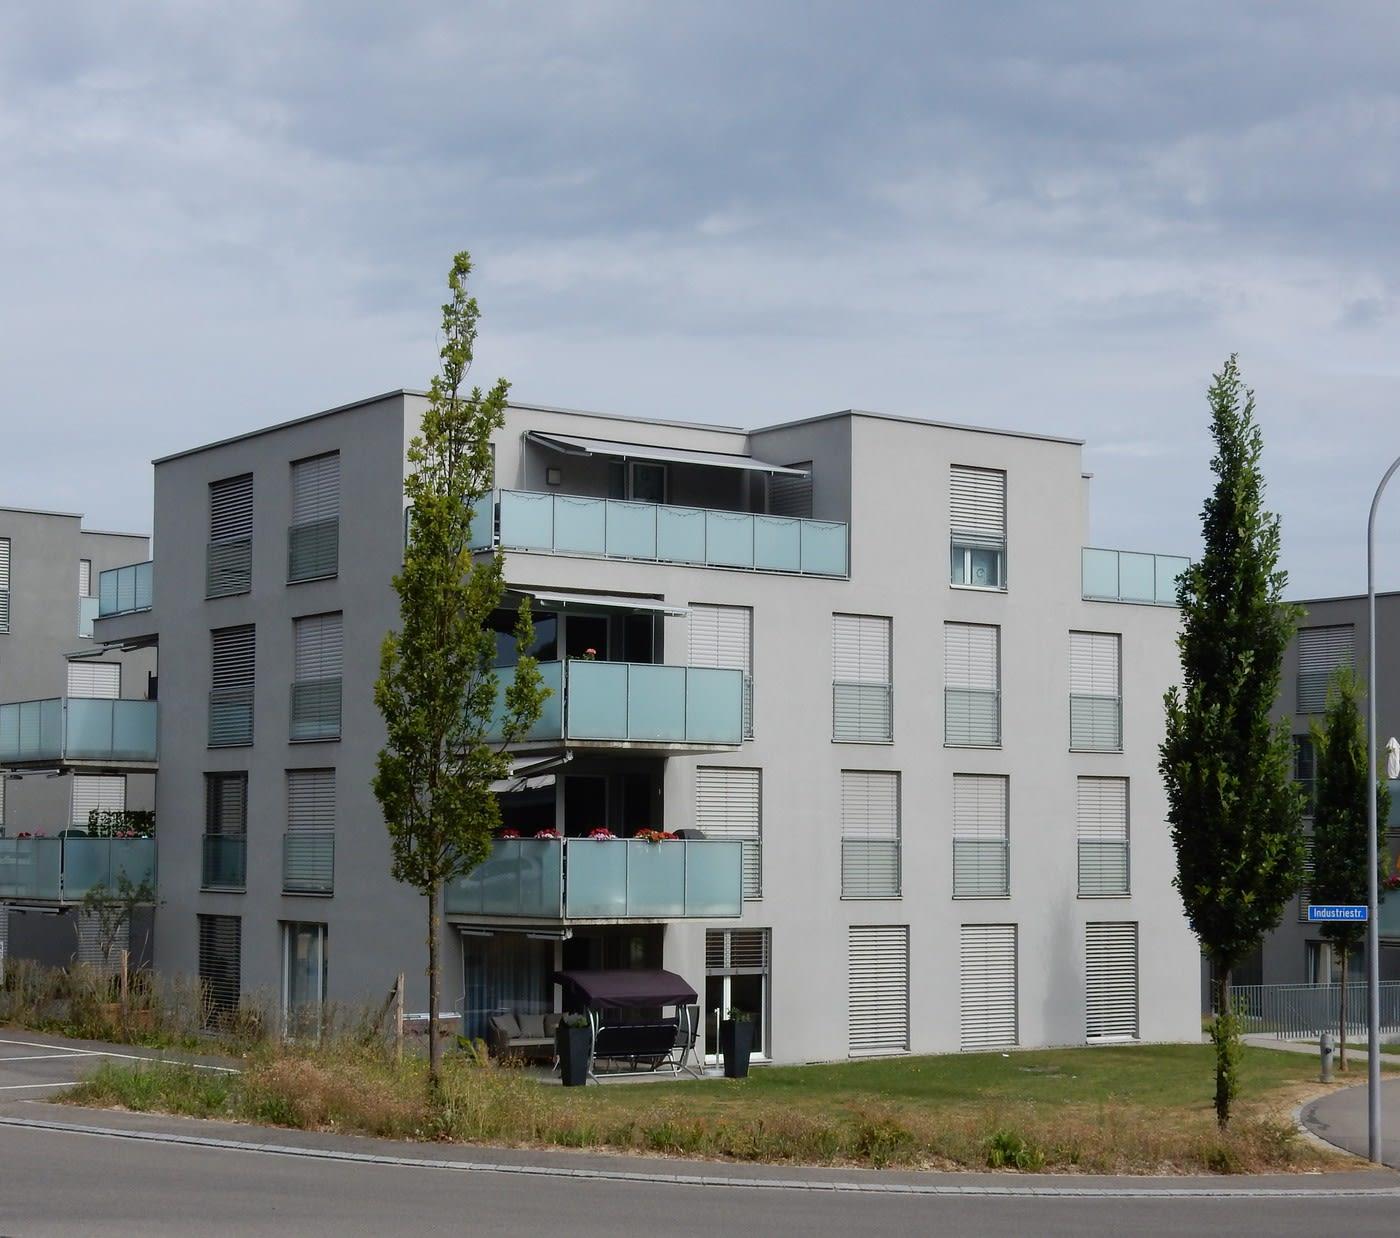 Bahnstrasse 77